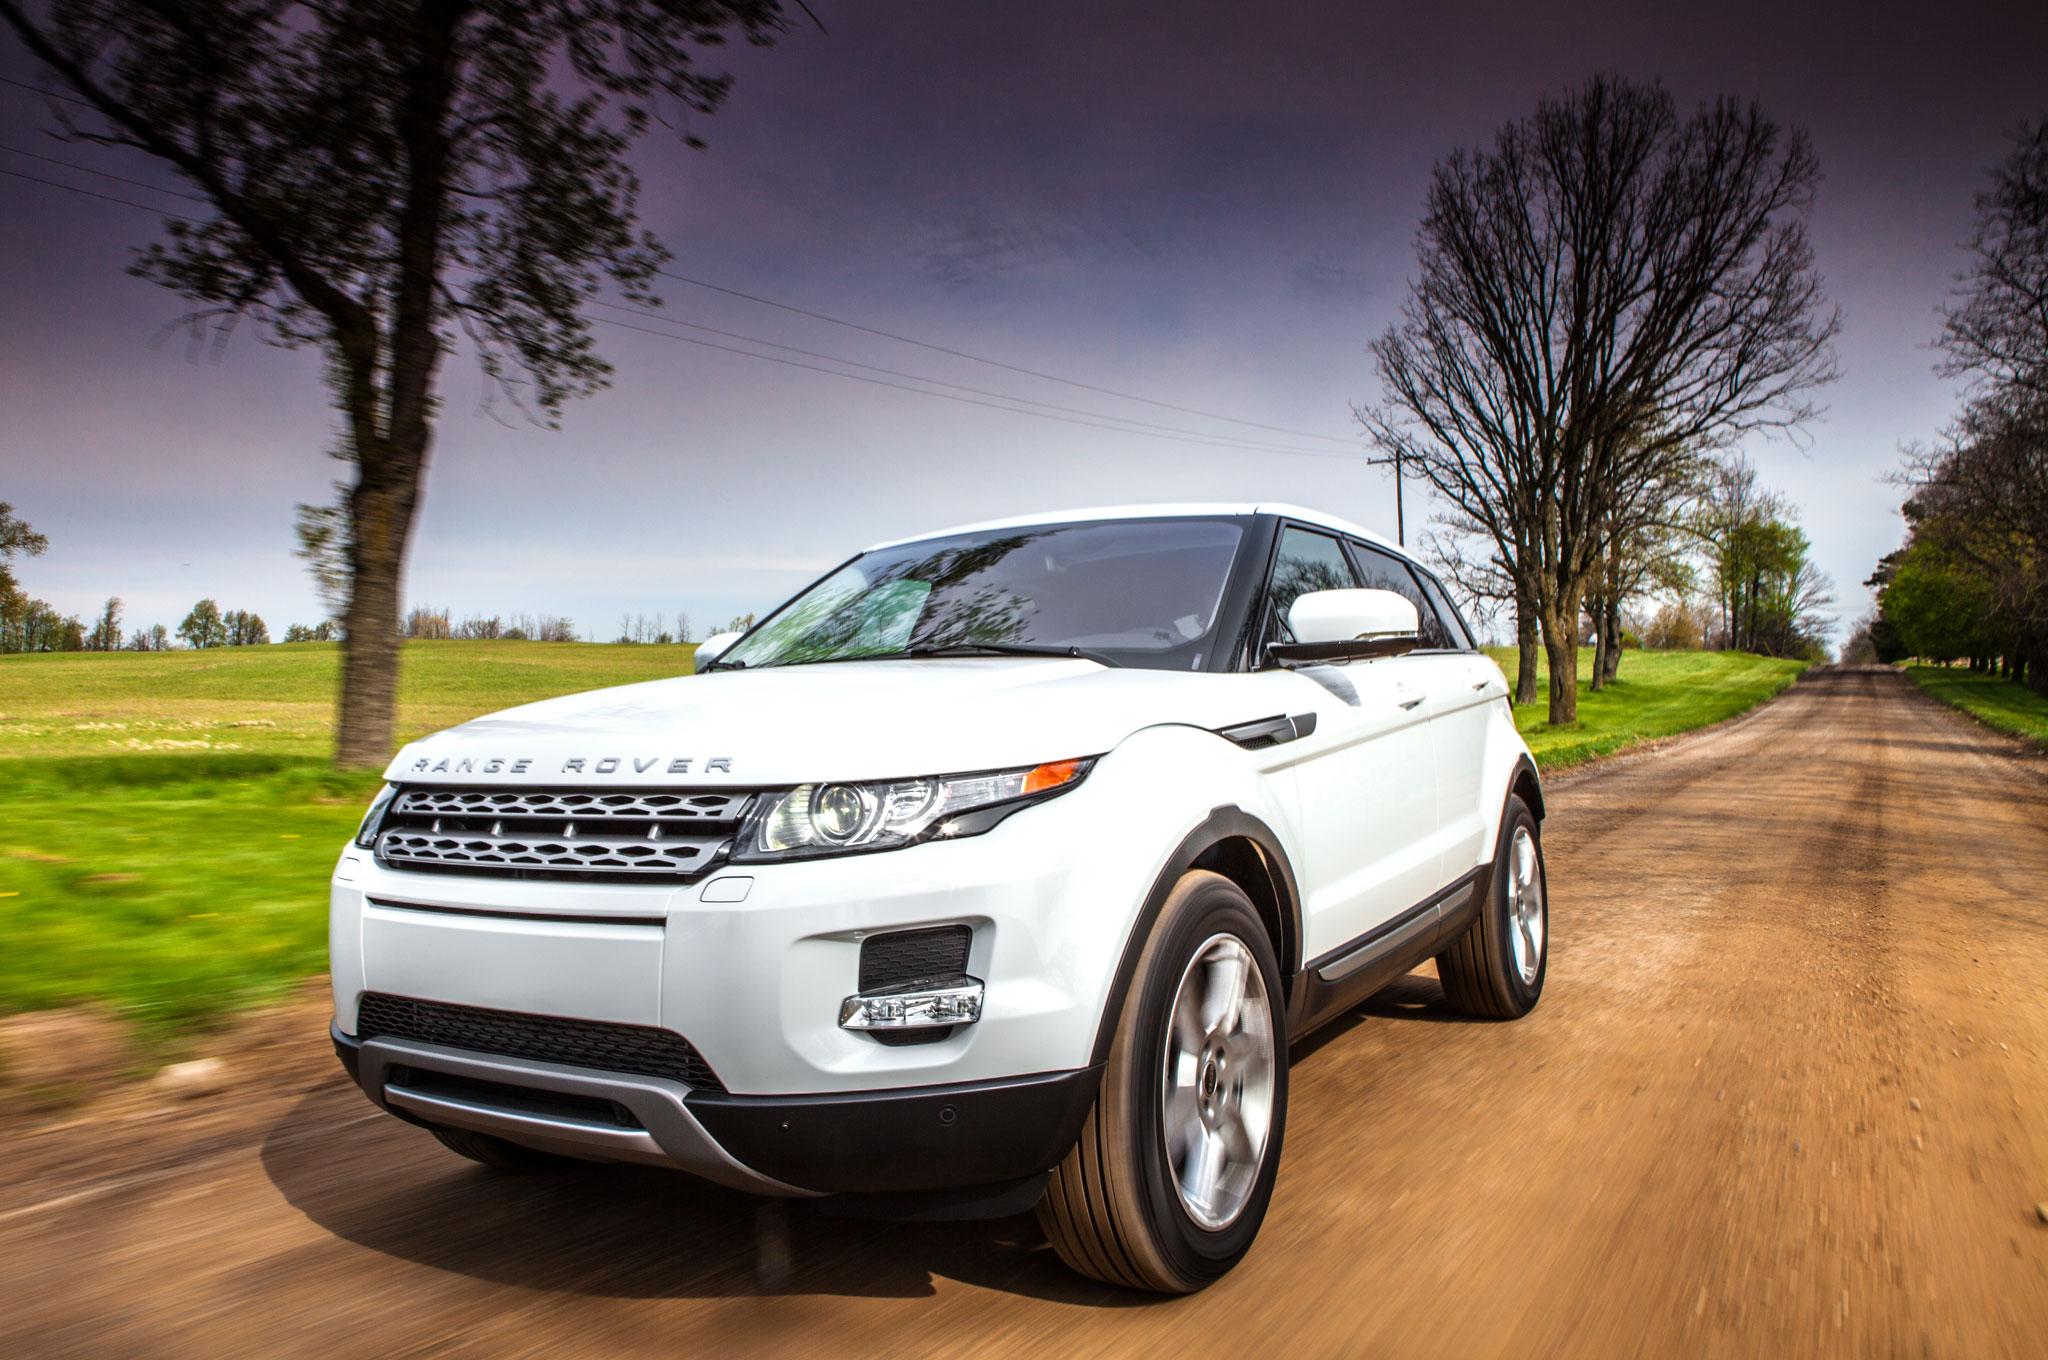 2012 land rover range rover evoque four seasons wrap up automobile magazine. Black Bedroom Furniture Sets. Home Design Ideas